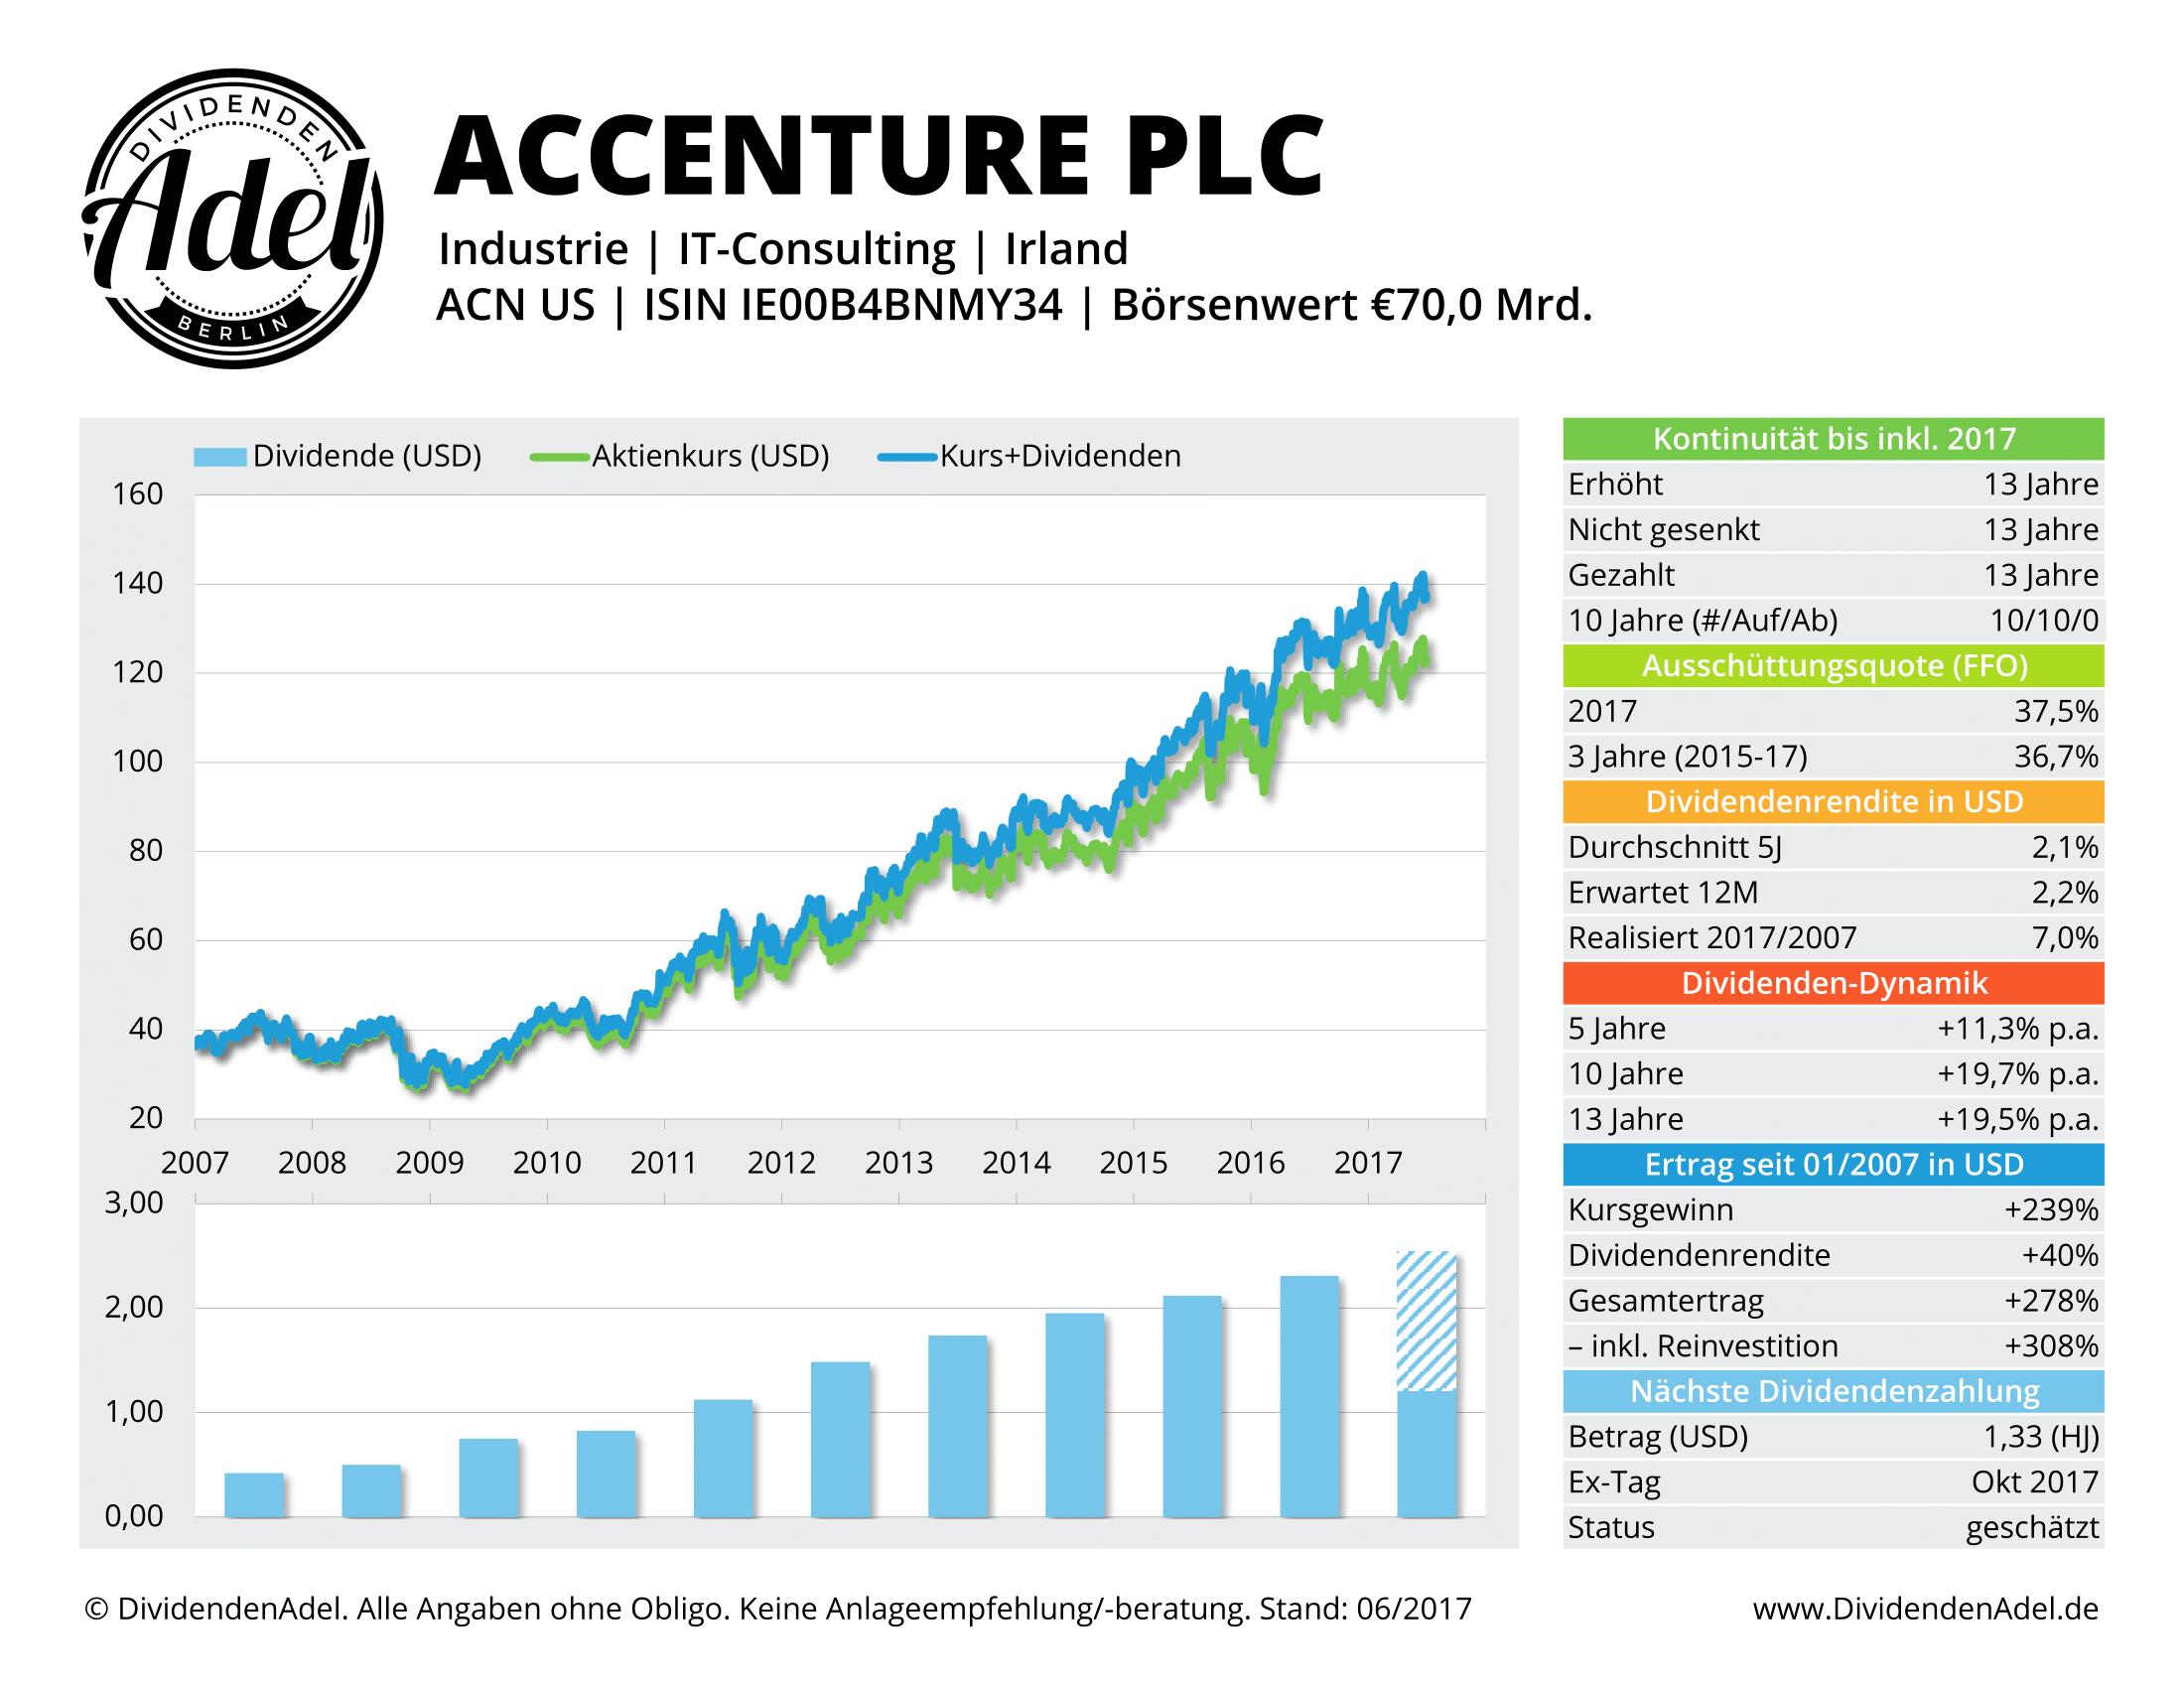 ACCENTURE PLC-A DividendenAdel-Profil